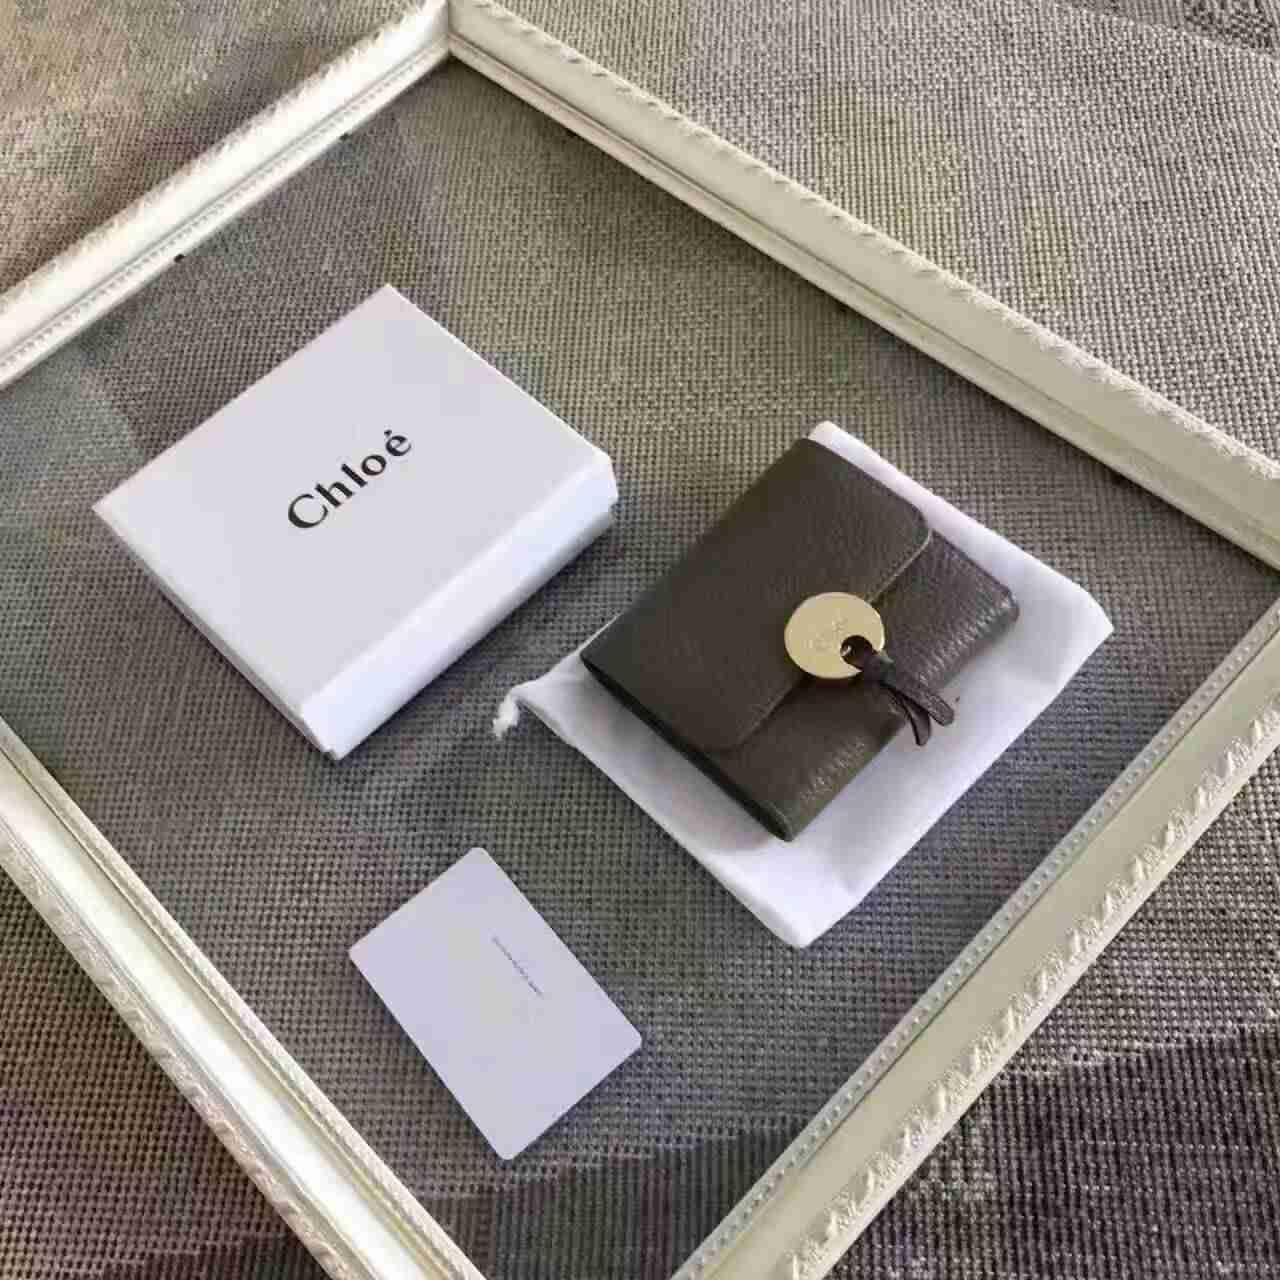 buy popular ae94f dd824 2017新作 クロエコピー 財布 CHLOE 優雅な シンプル レディース 三つ折財布 161124CE-5